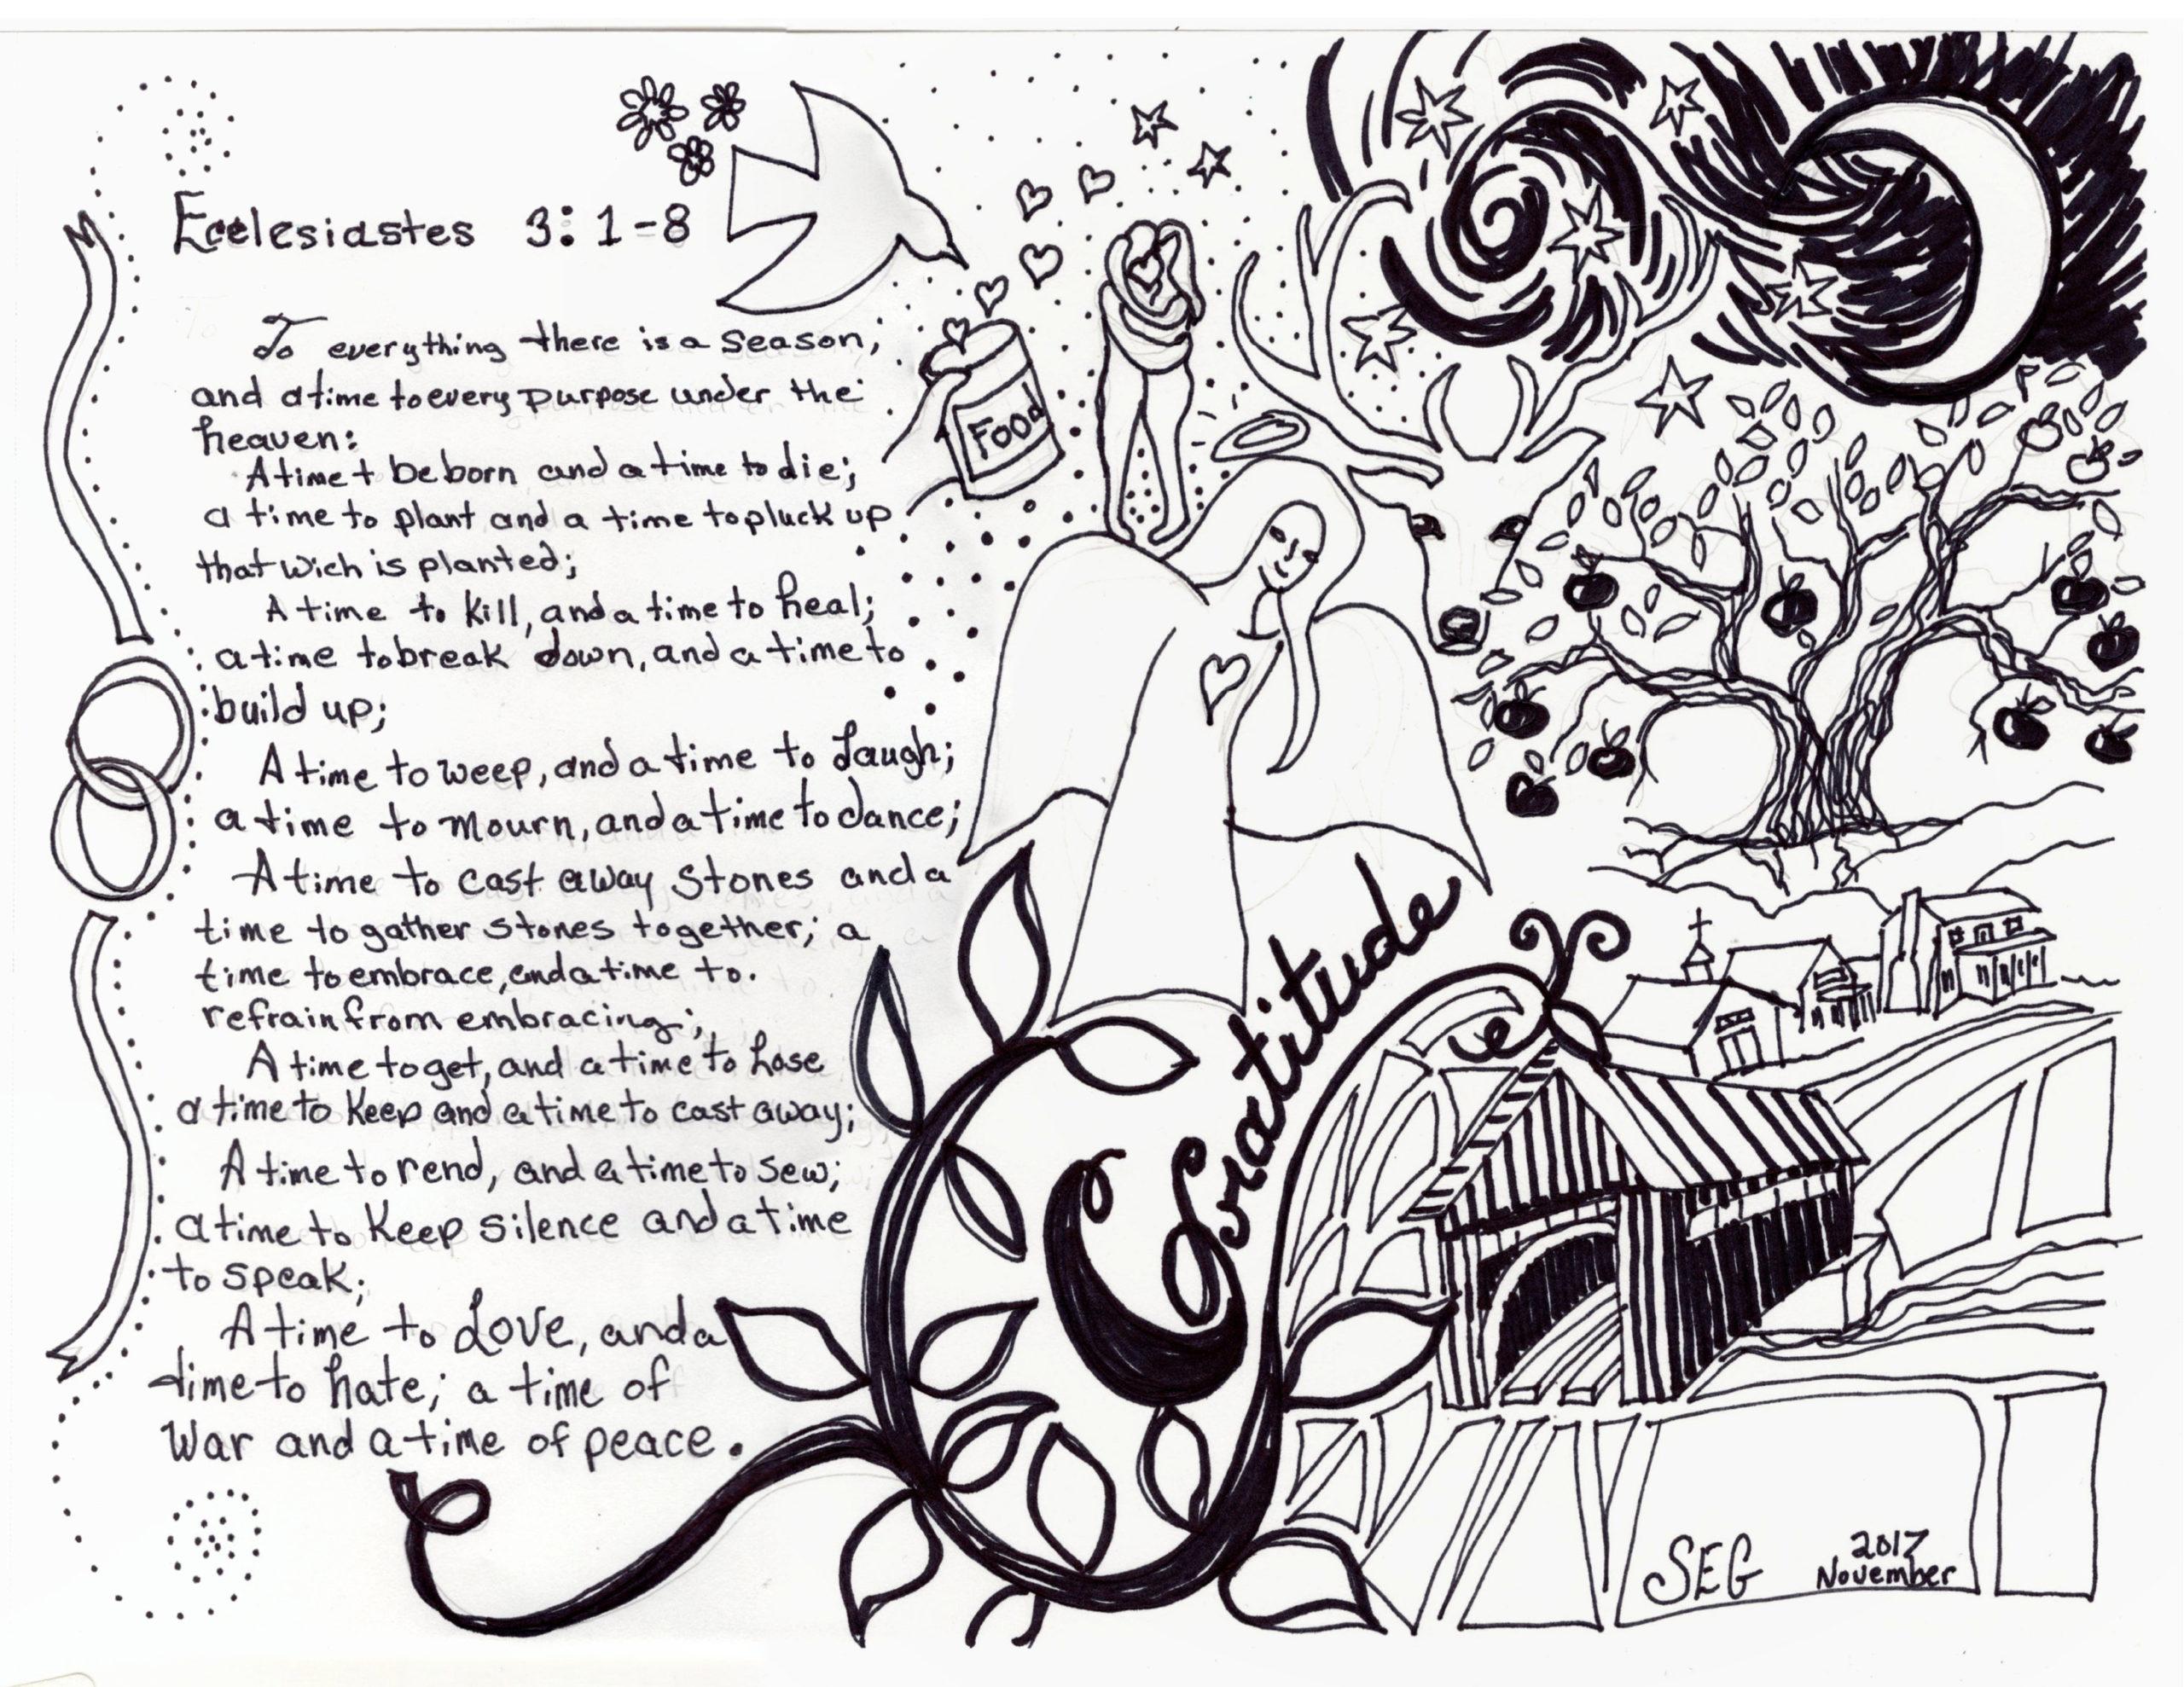 artwork by sue ellen gorman